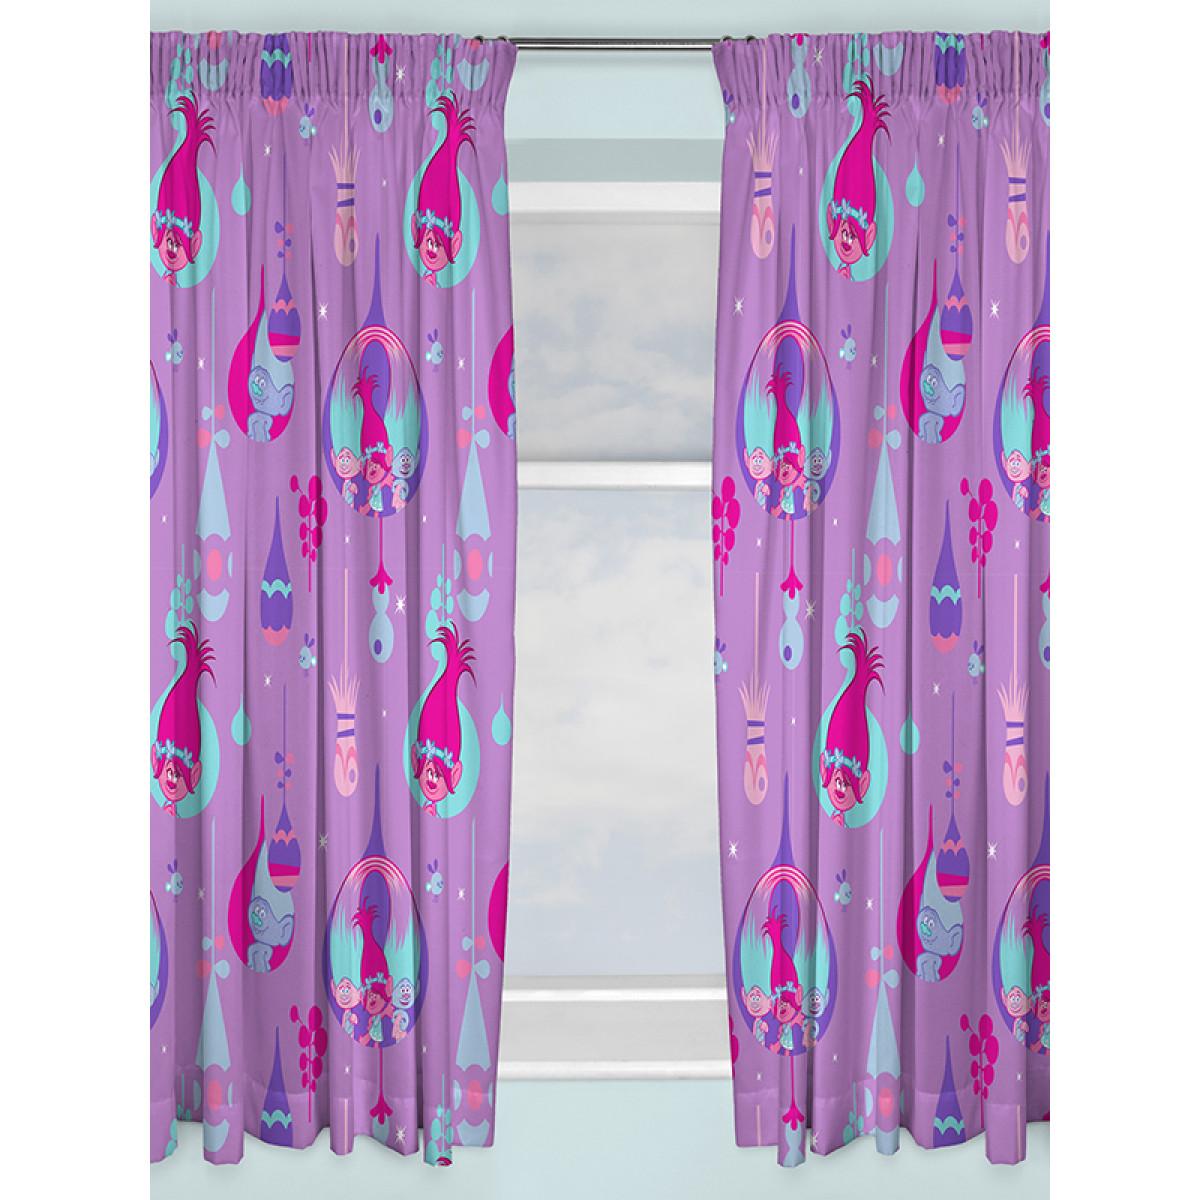 Trolls Curtains Bedroom Poppy Furnishings